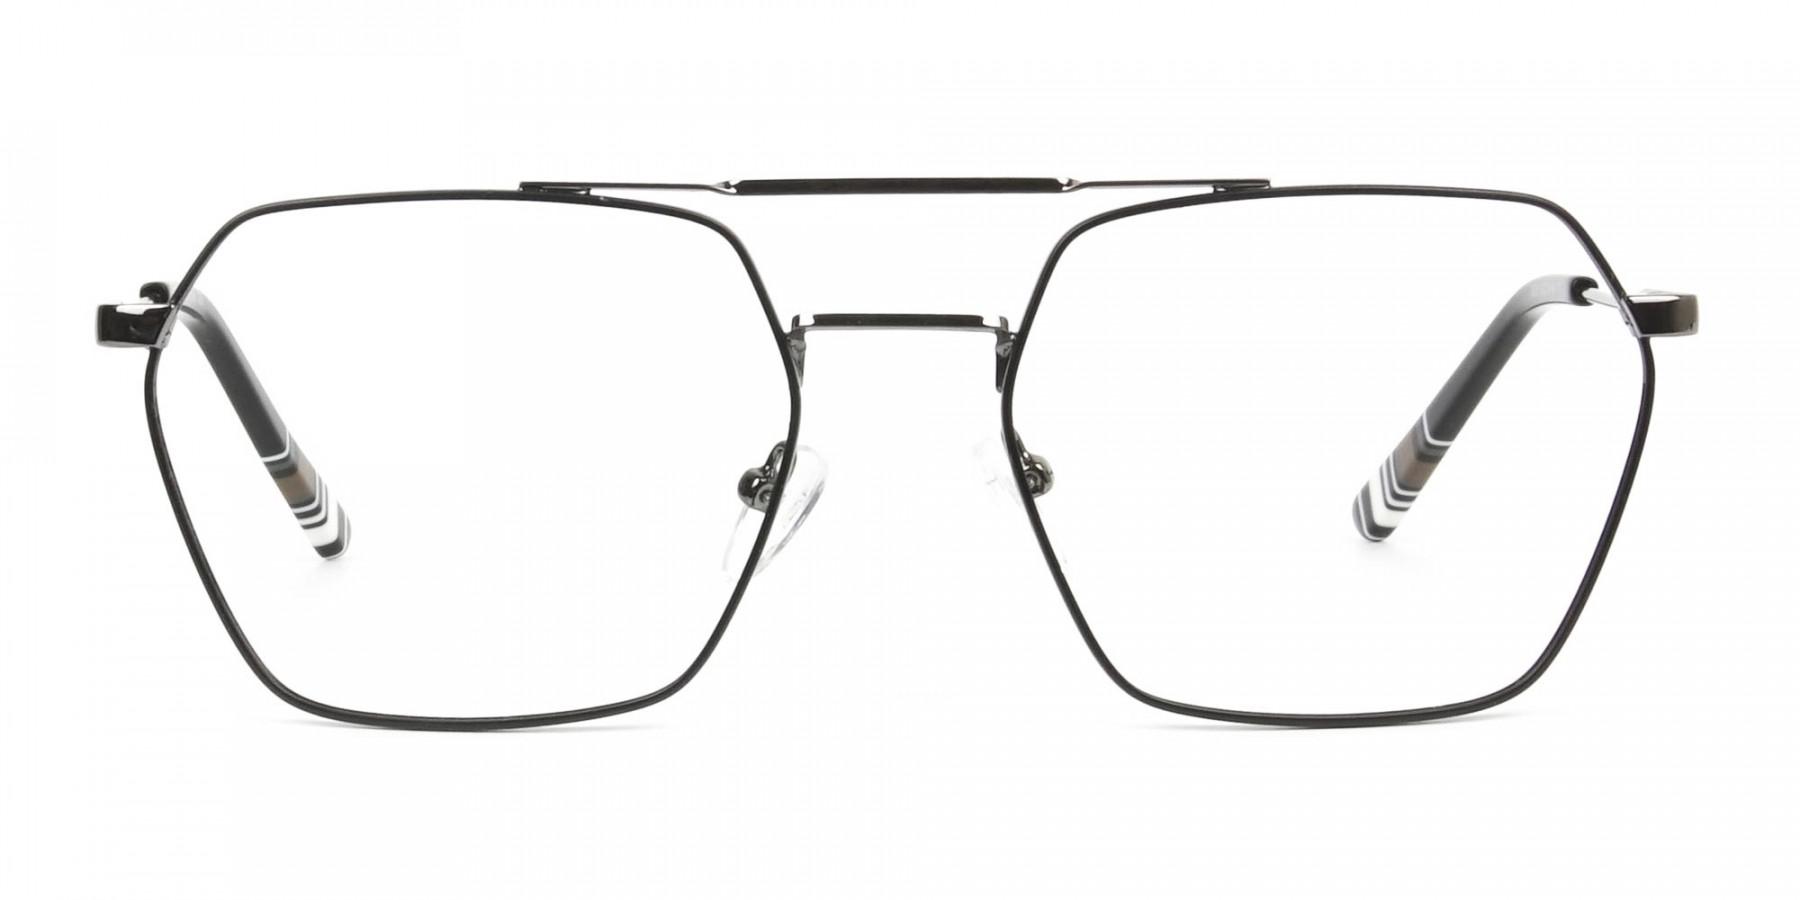 Hipster Geometric Black & Gunmetal Thin Metal Frame Glasses - 1